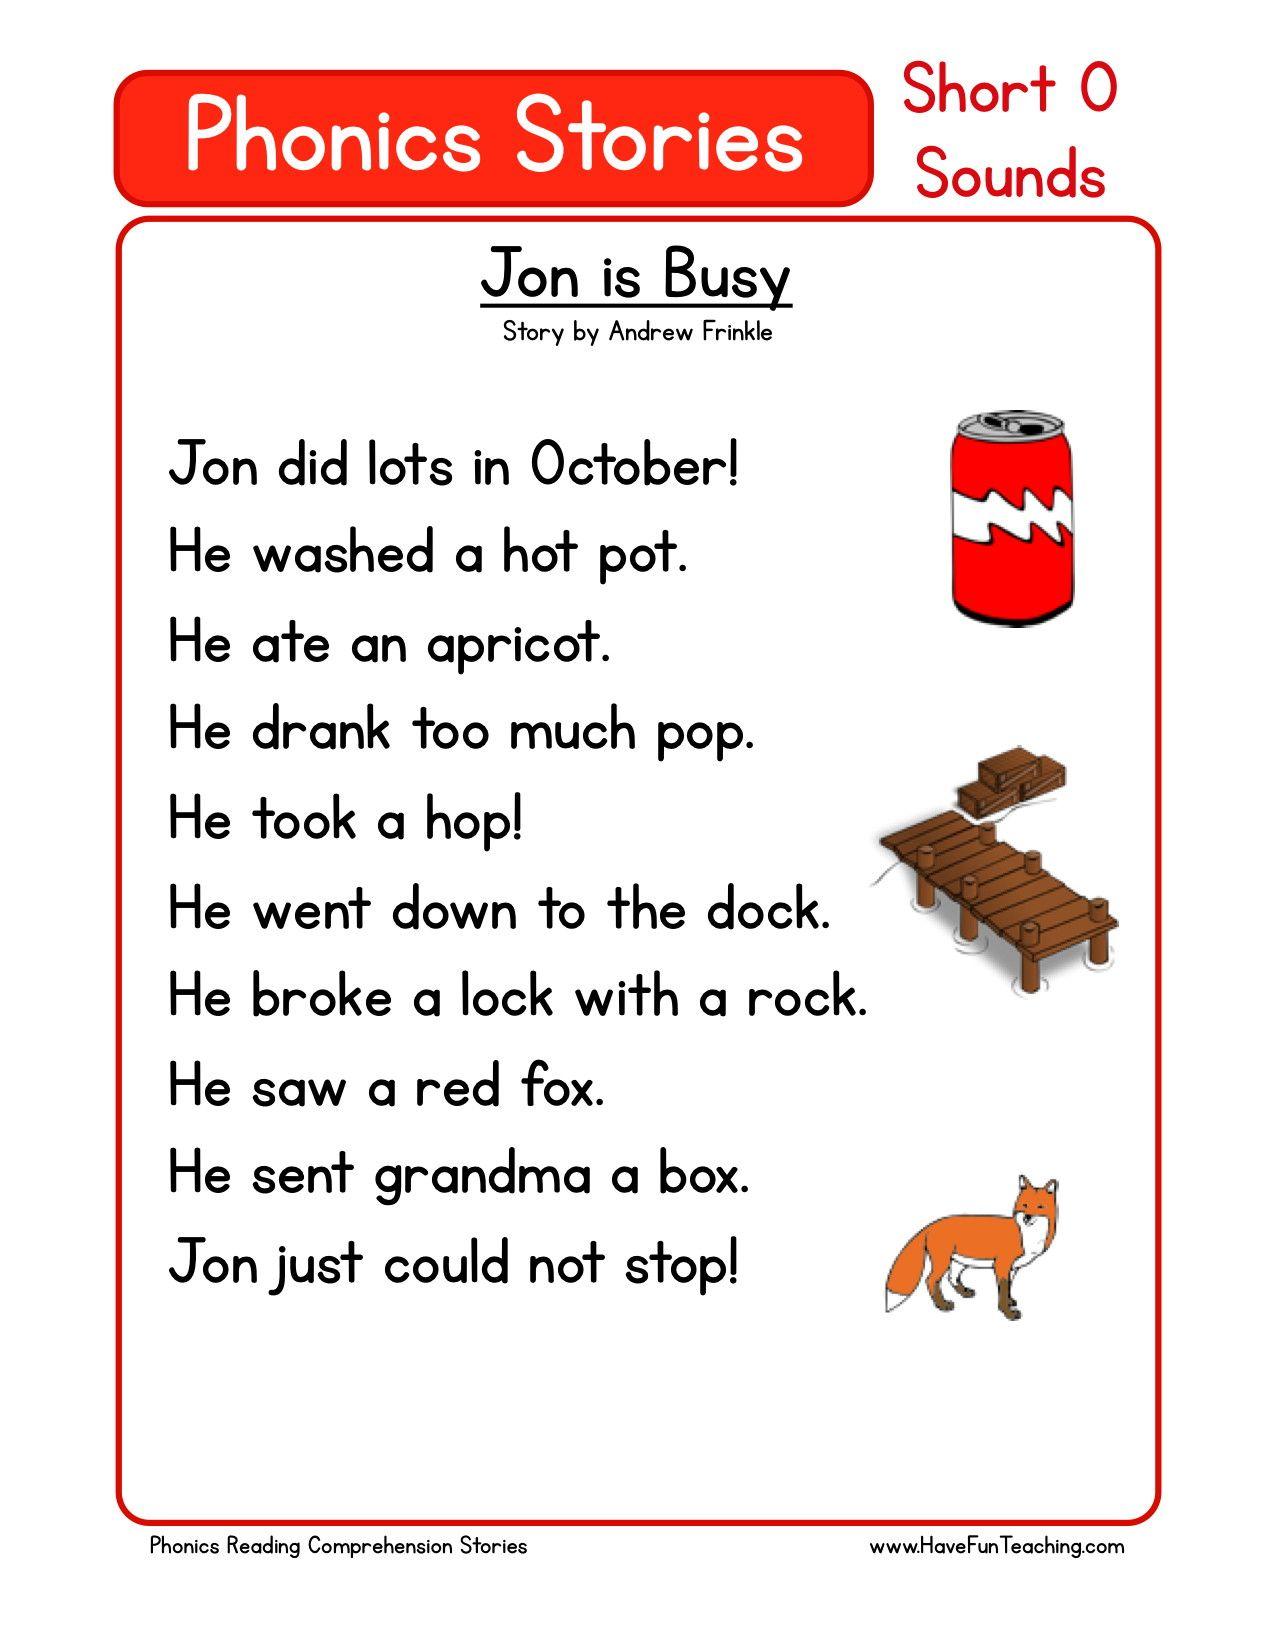 Reading Comprehension Worksheet - Jon Busy